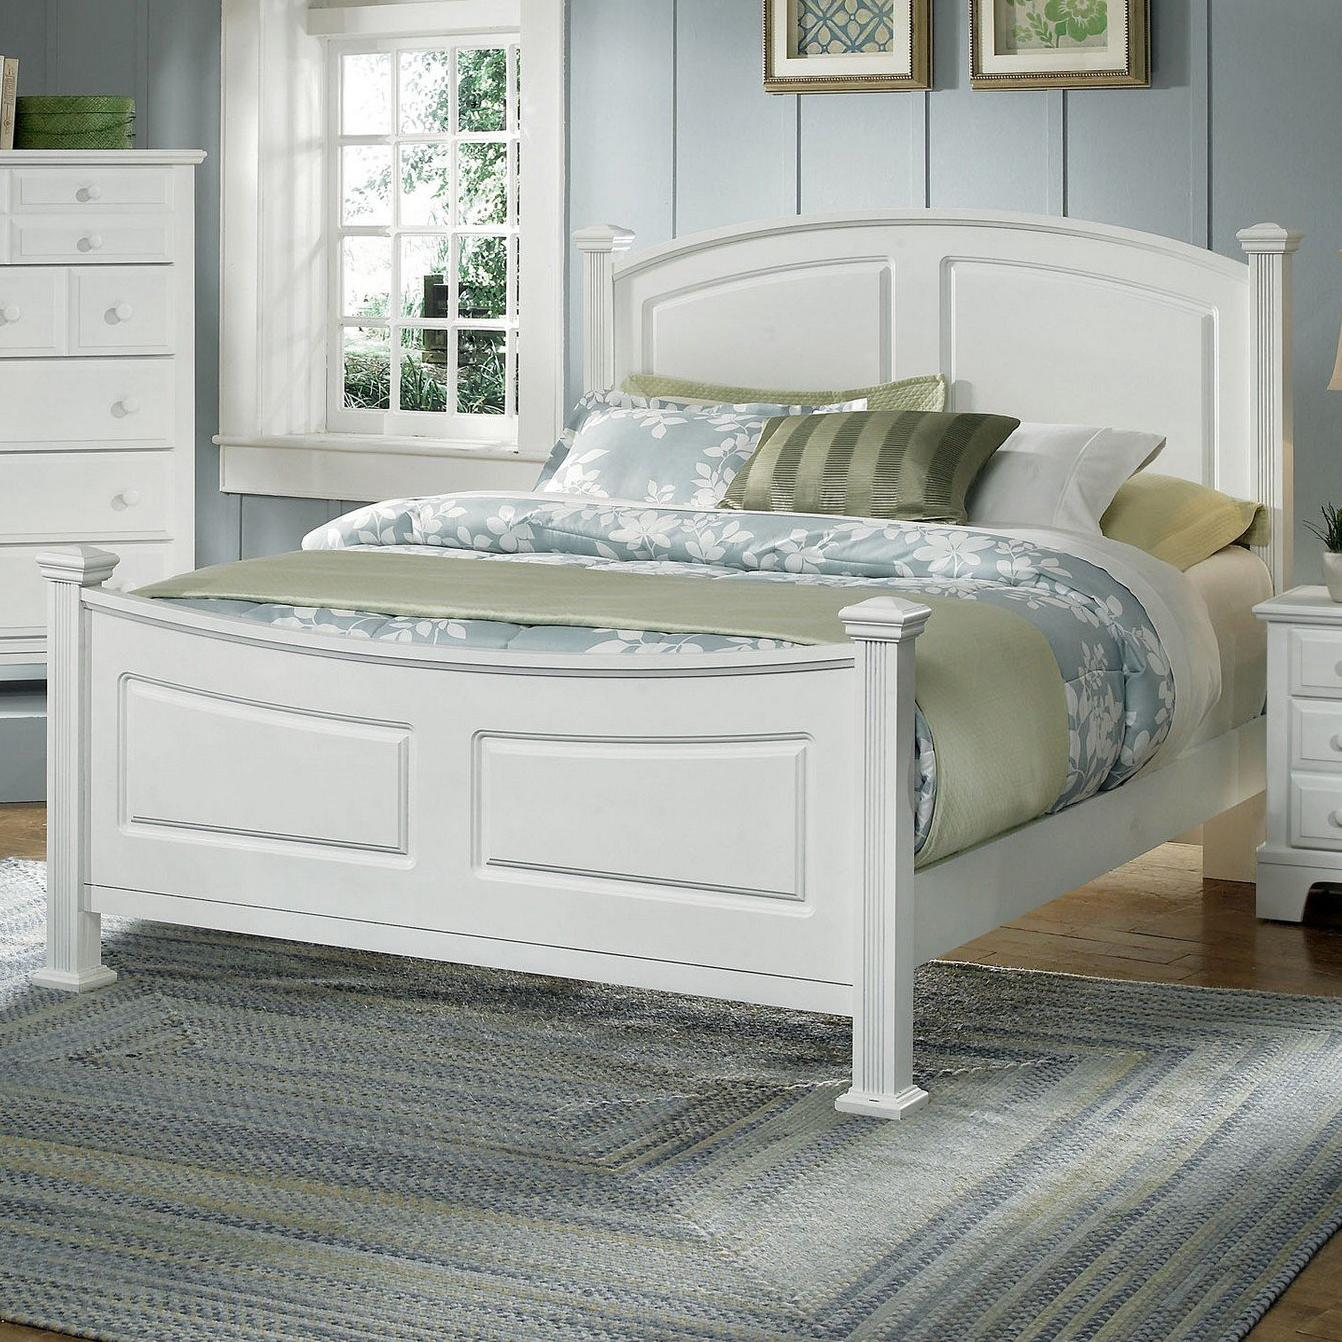 Hamilton/Franklin King Panel Bed by Vaughan Bassett at Johnny Janosik